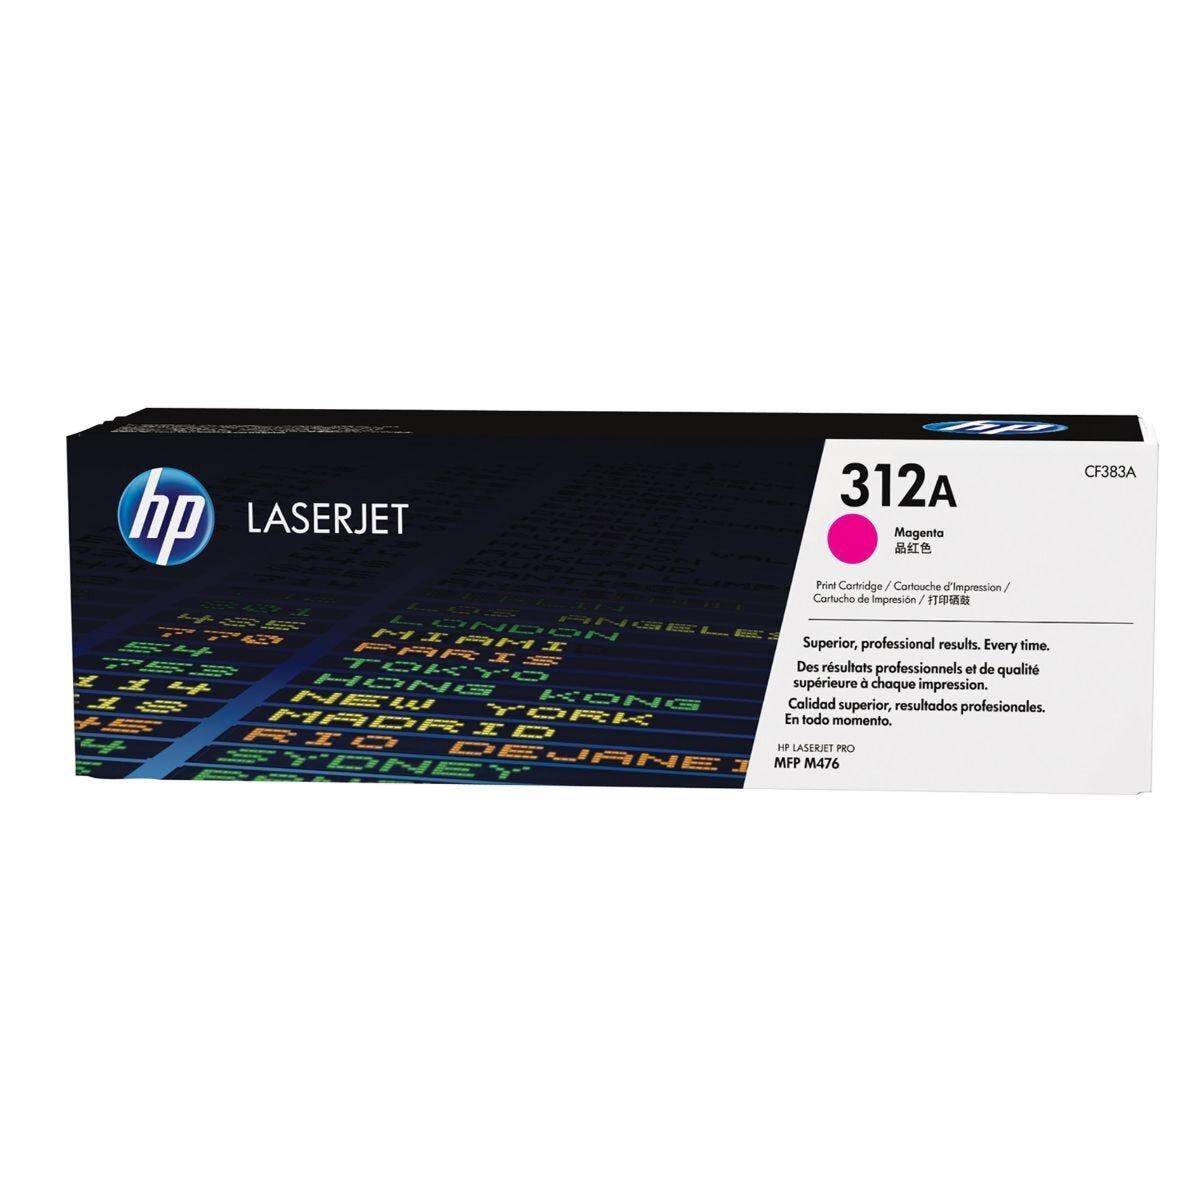 HP 312A Laser Toner Cartridge Magenta CF383A